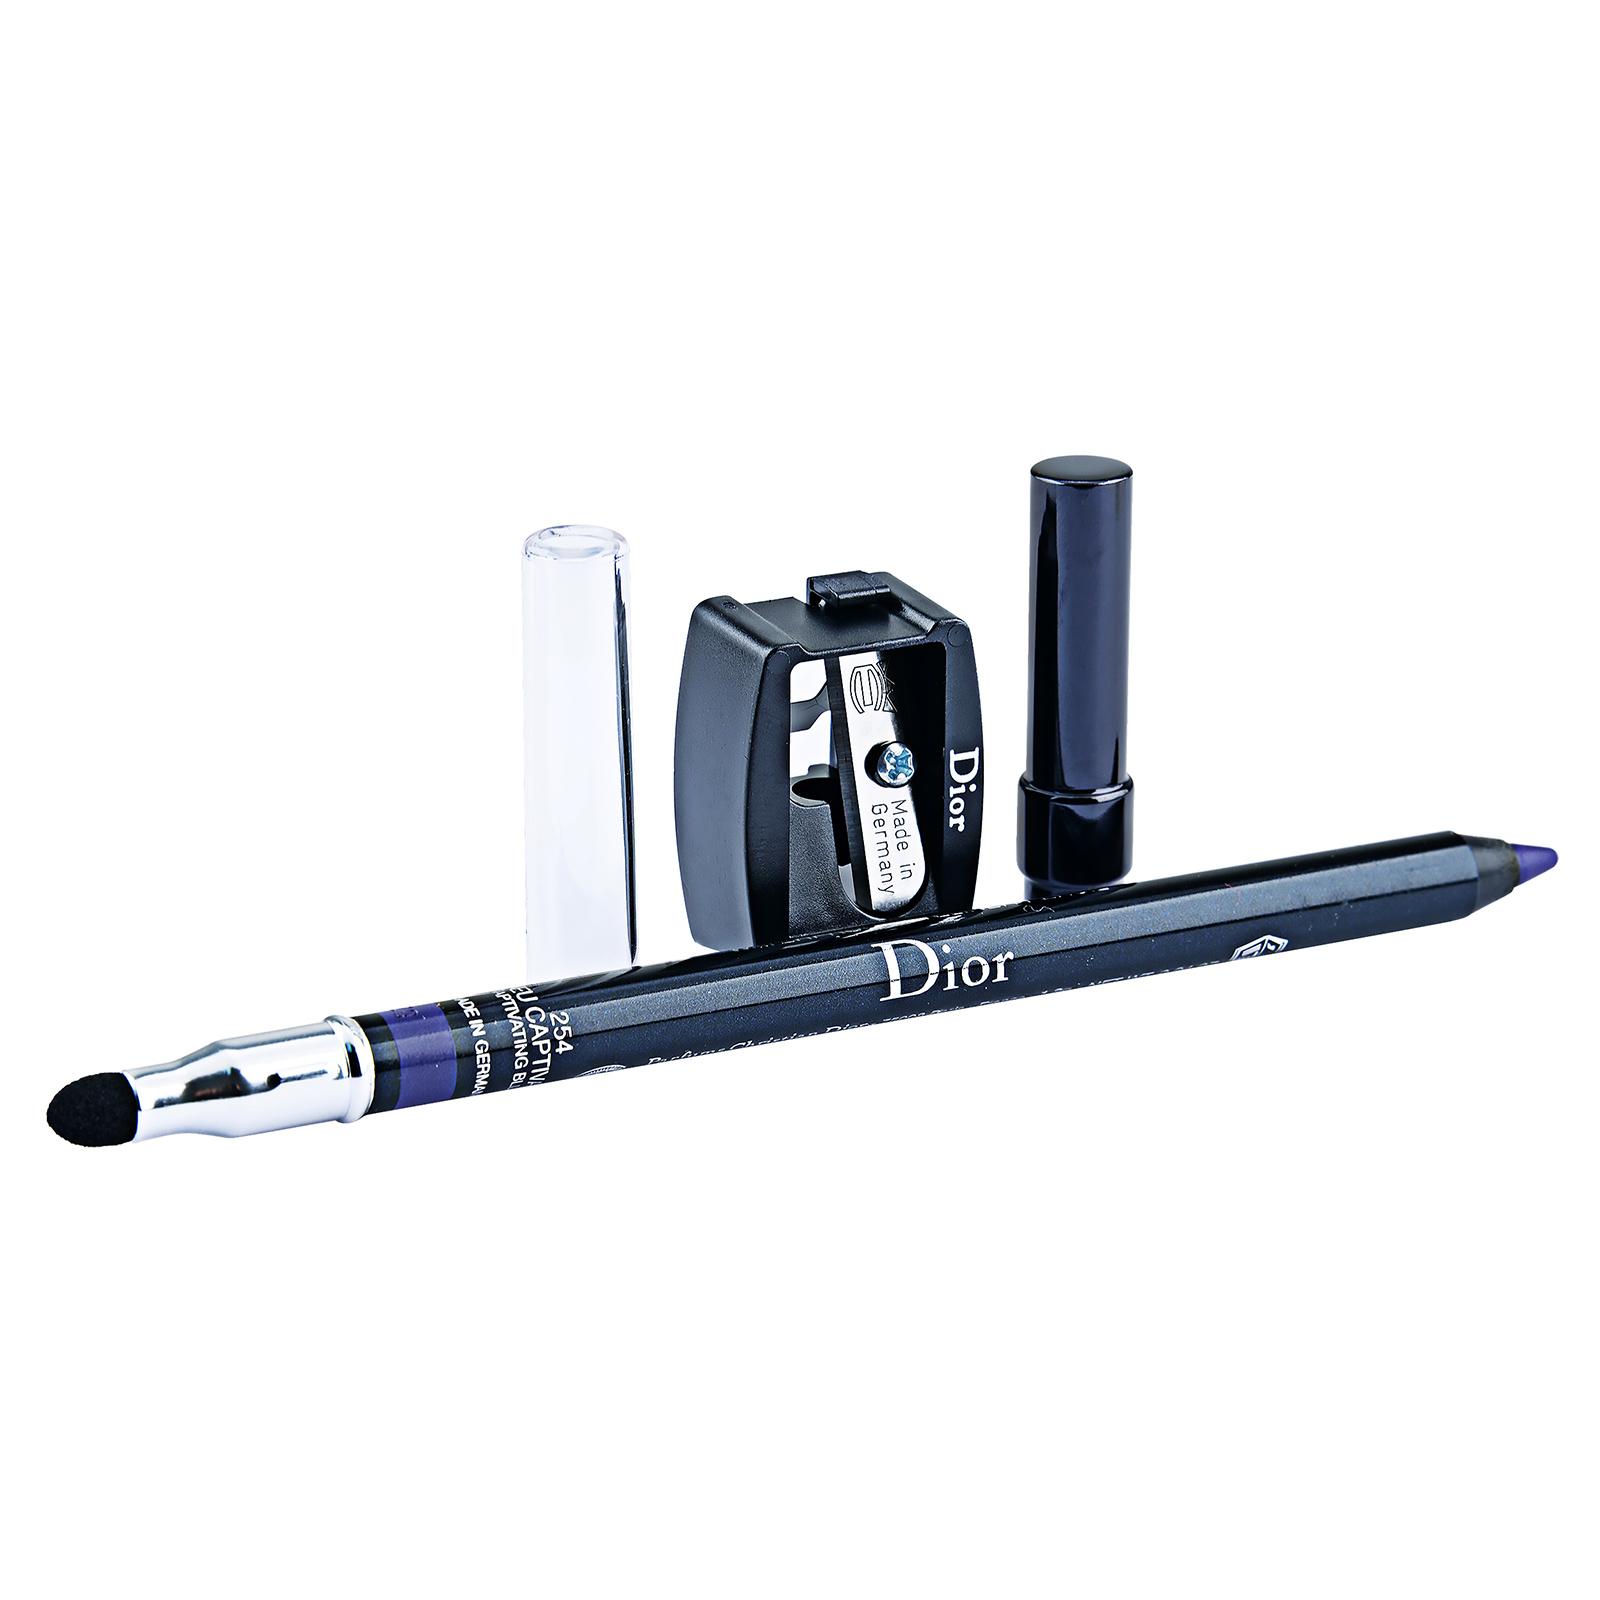 Christian Dior Long-Wear Waterproof Eyeliner Pencil 254 Captivating Blue, 0.04oz, 1.2g